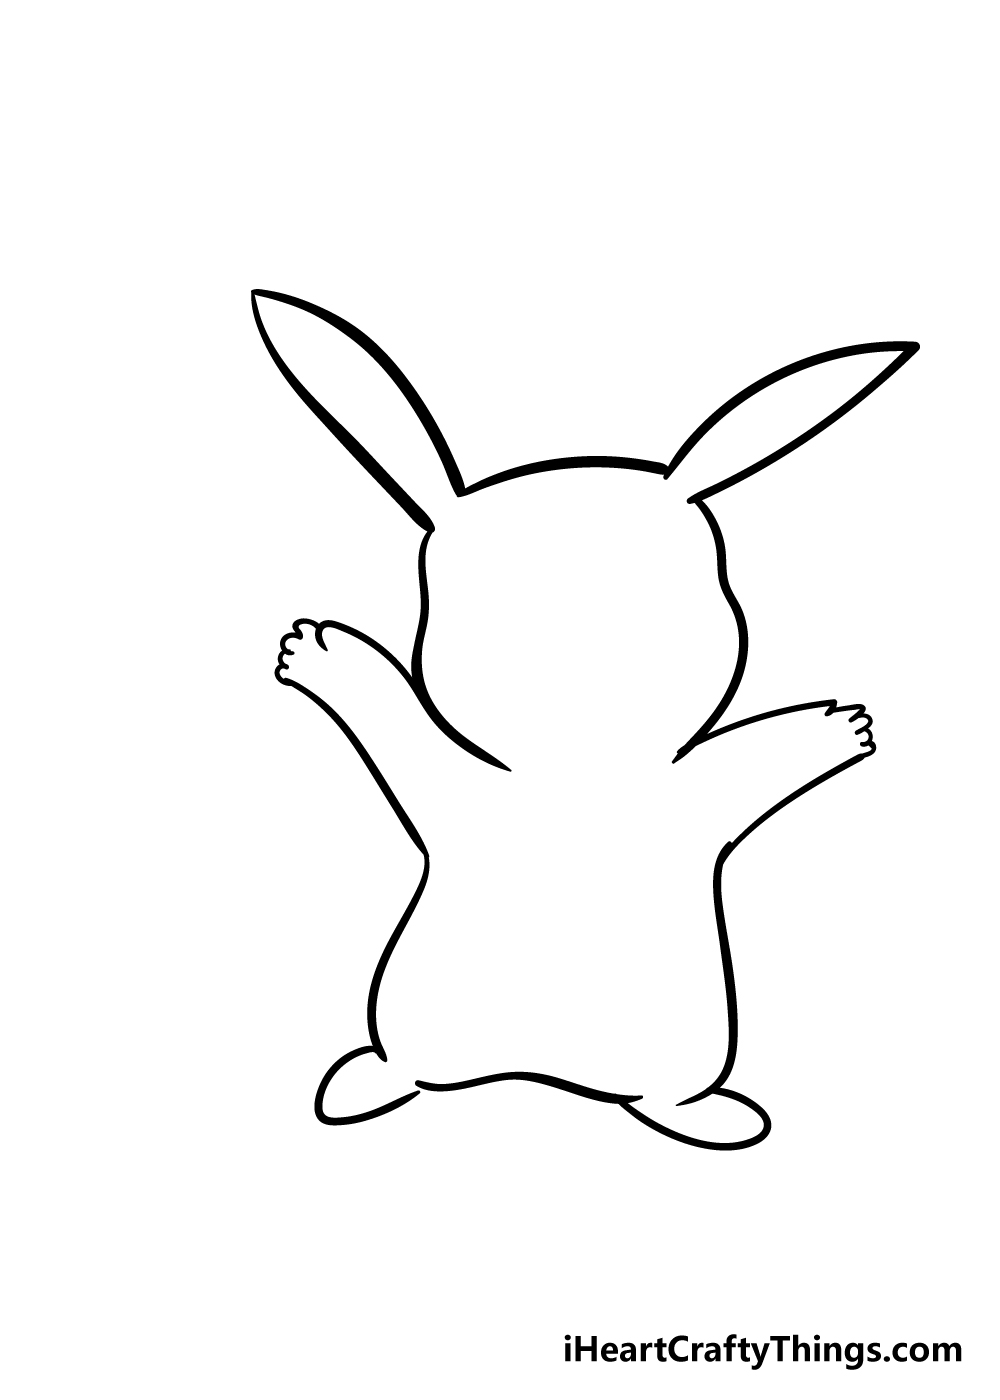 pikachu drawing step 4